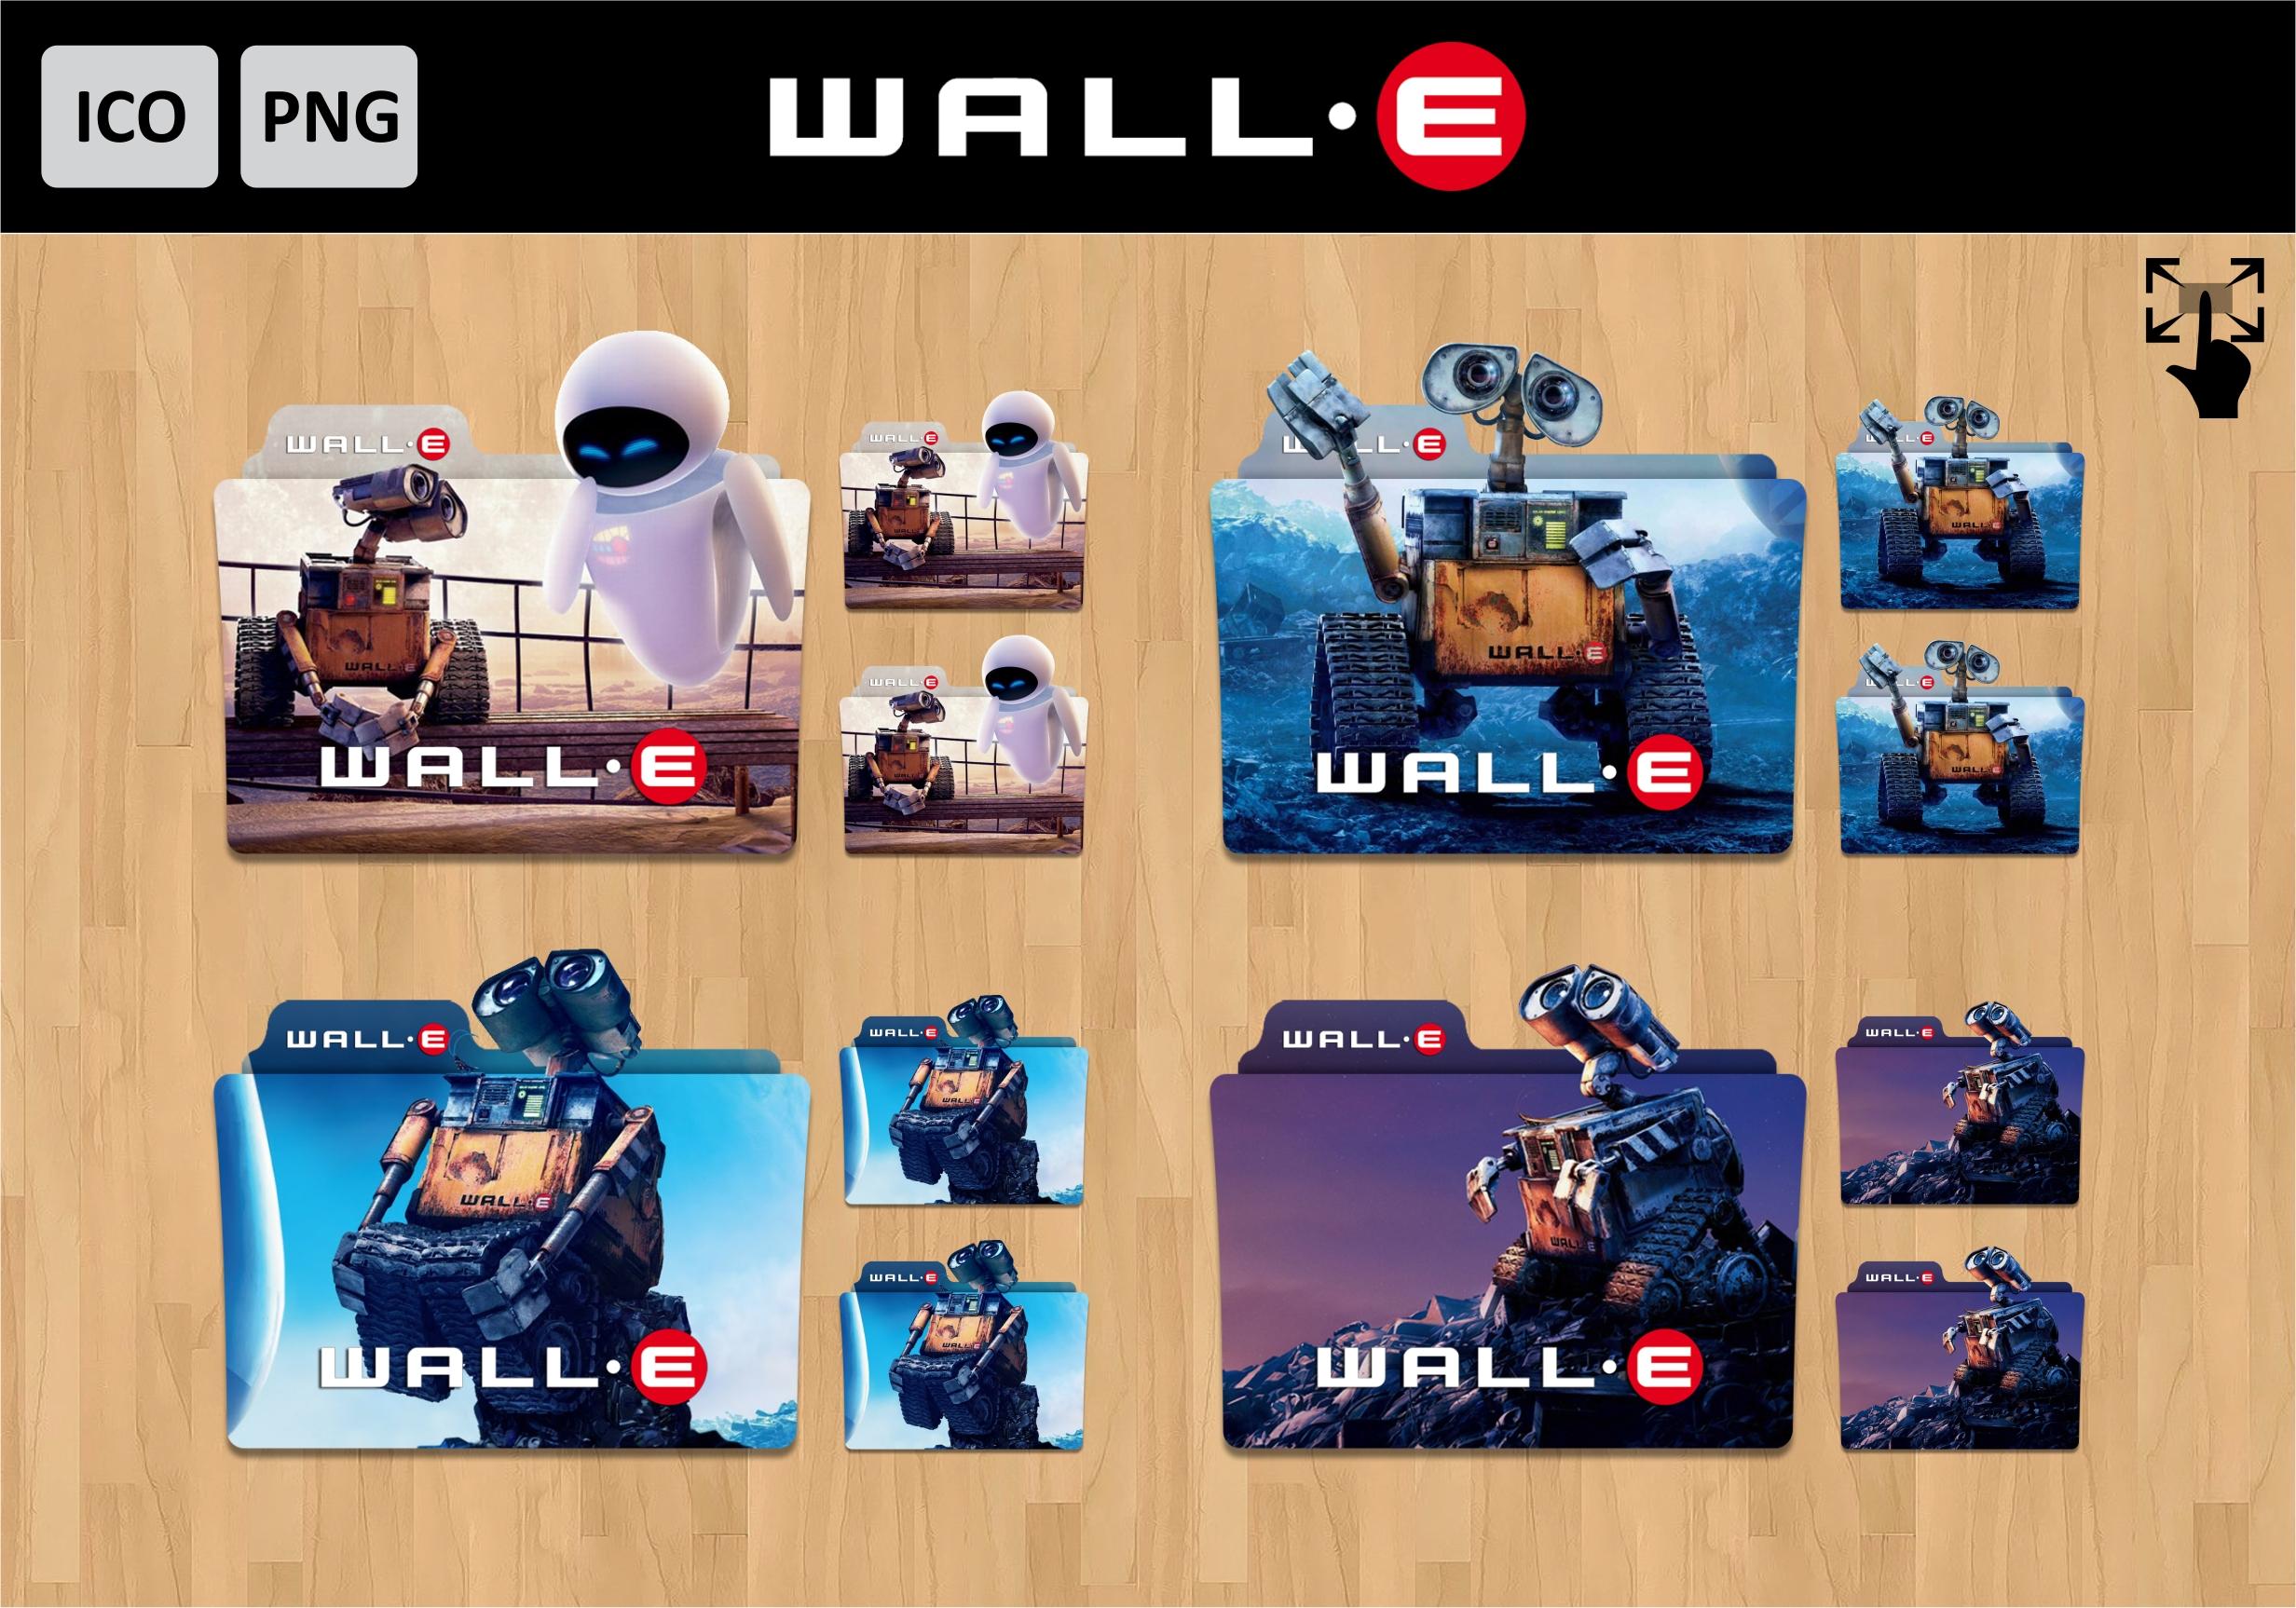 Wall E 2008 Folder Icon Pack By Dianzpurba On Deviantart